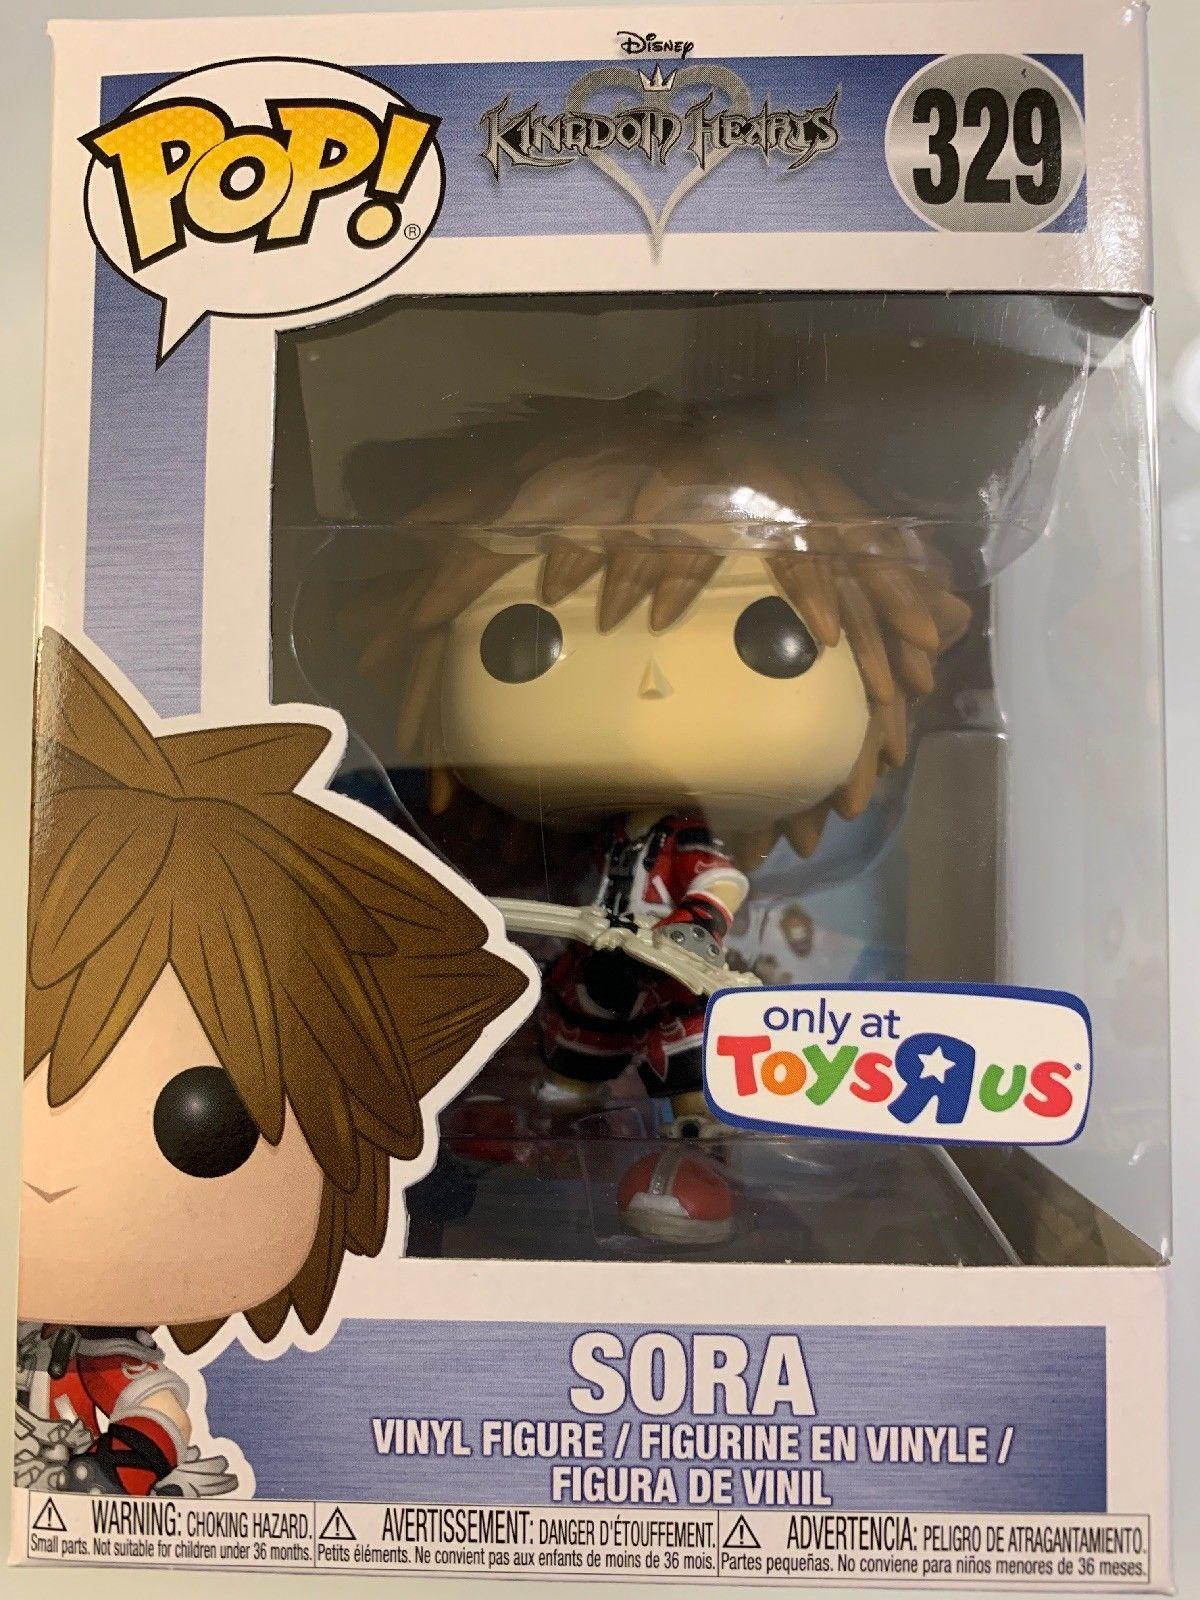 Sold Out Vaulted Funko Pop Sora Brave 329 Disney Kingdom Hearts Toys R Us Excl Disney Kingdom Hearts Disney Kingdom Funko Pop Disney